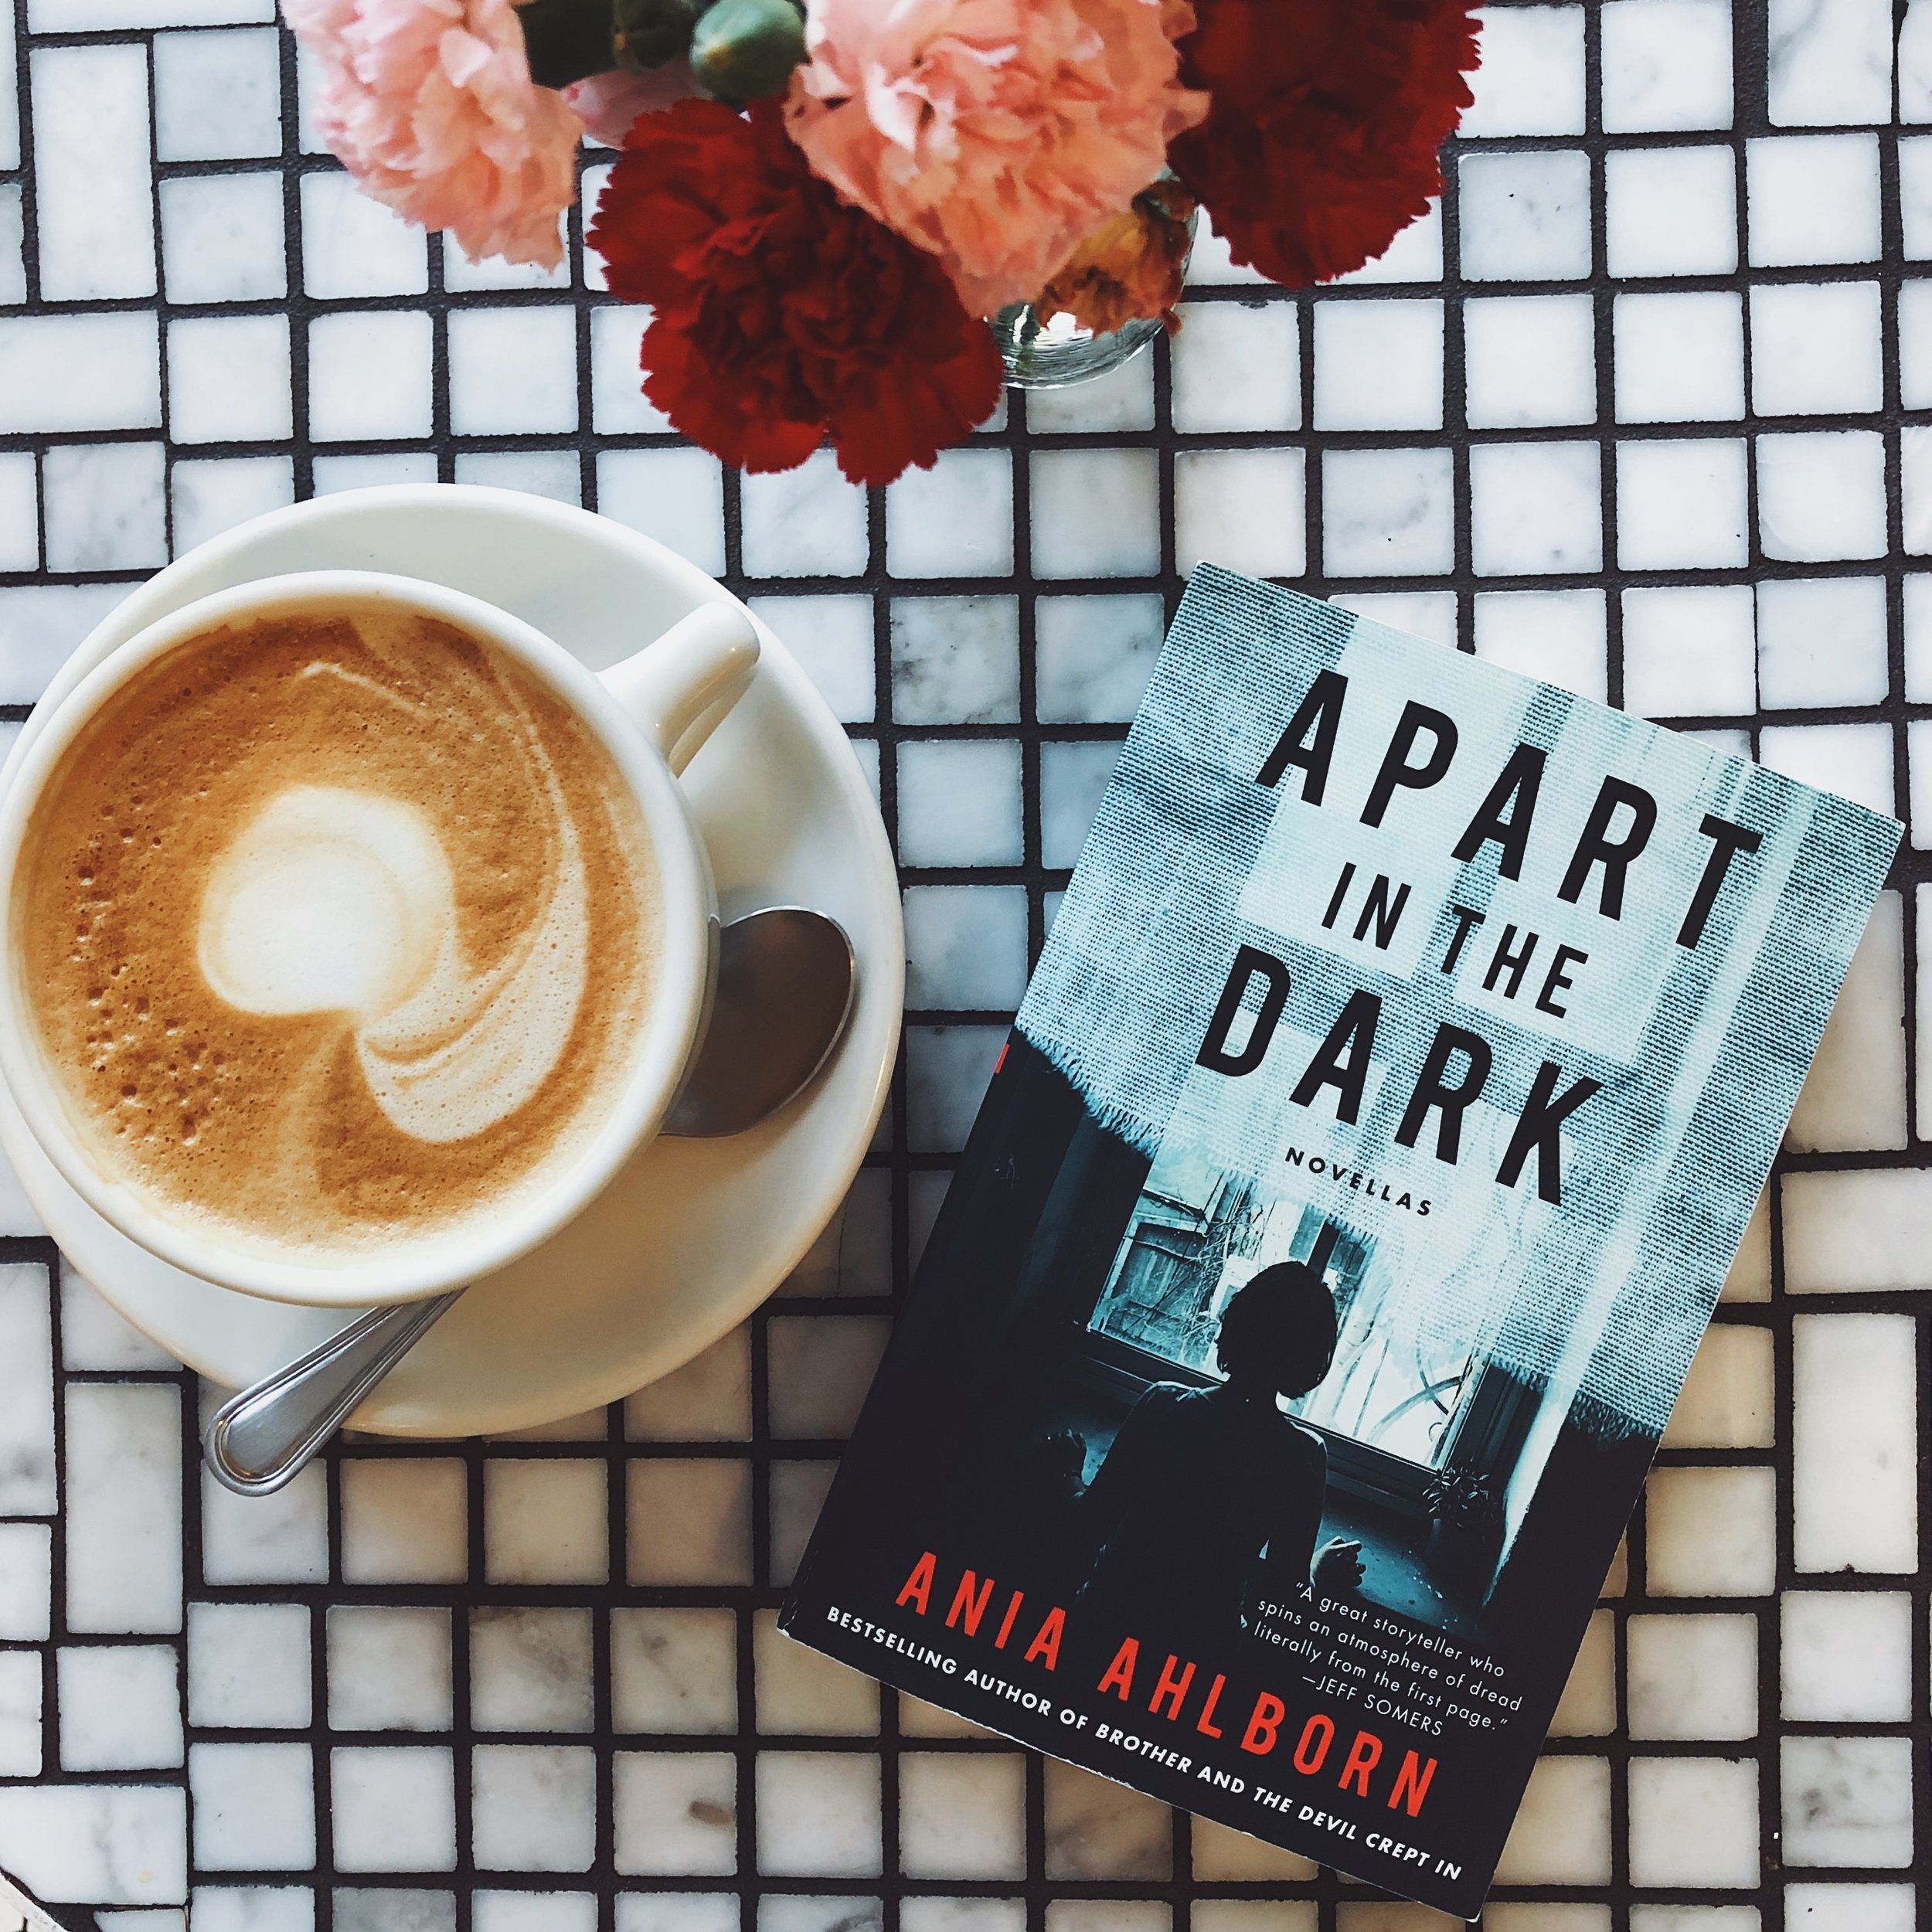 Apart in the Dark.jpg